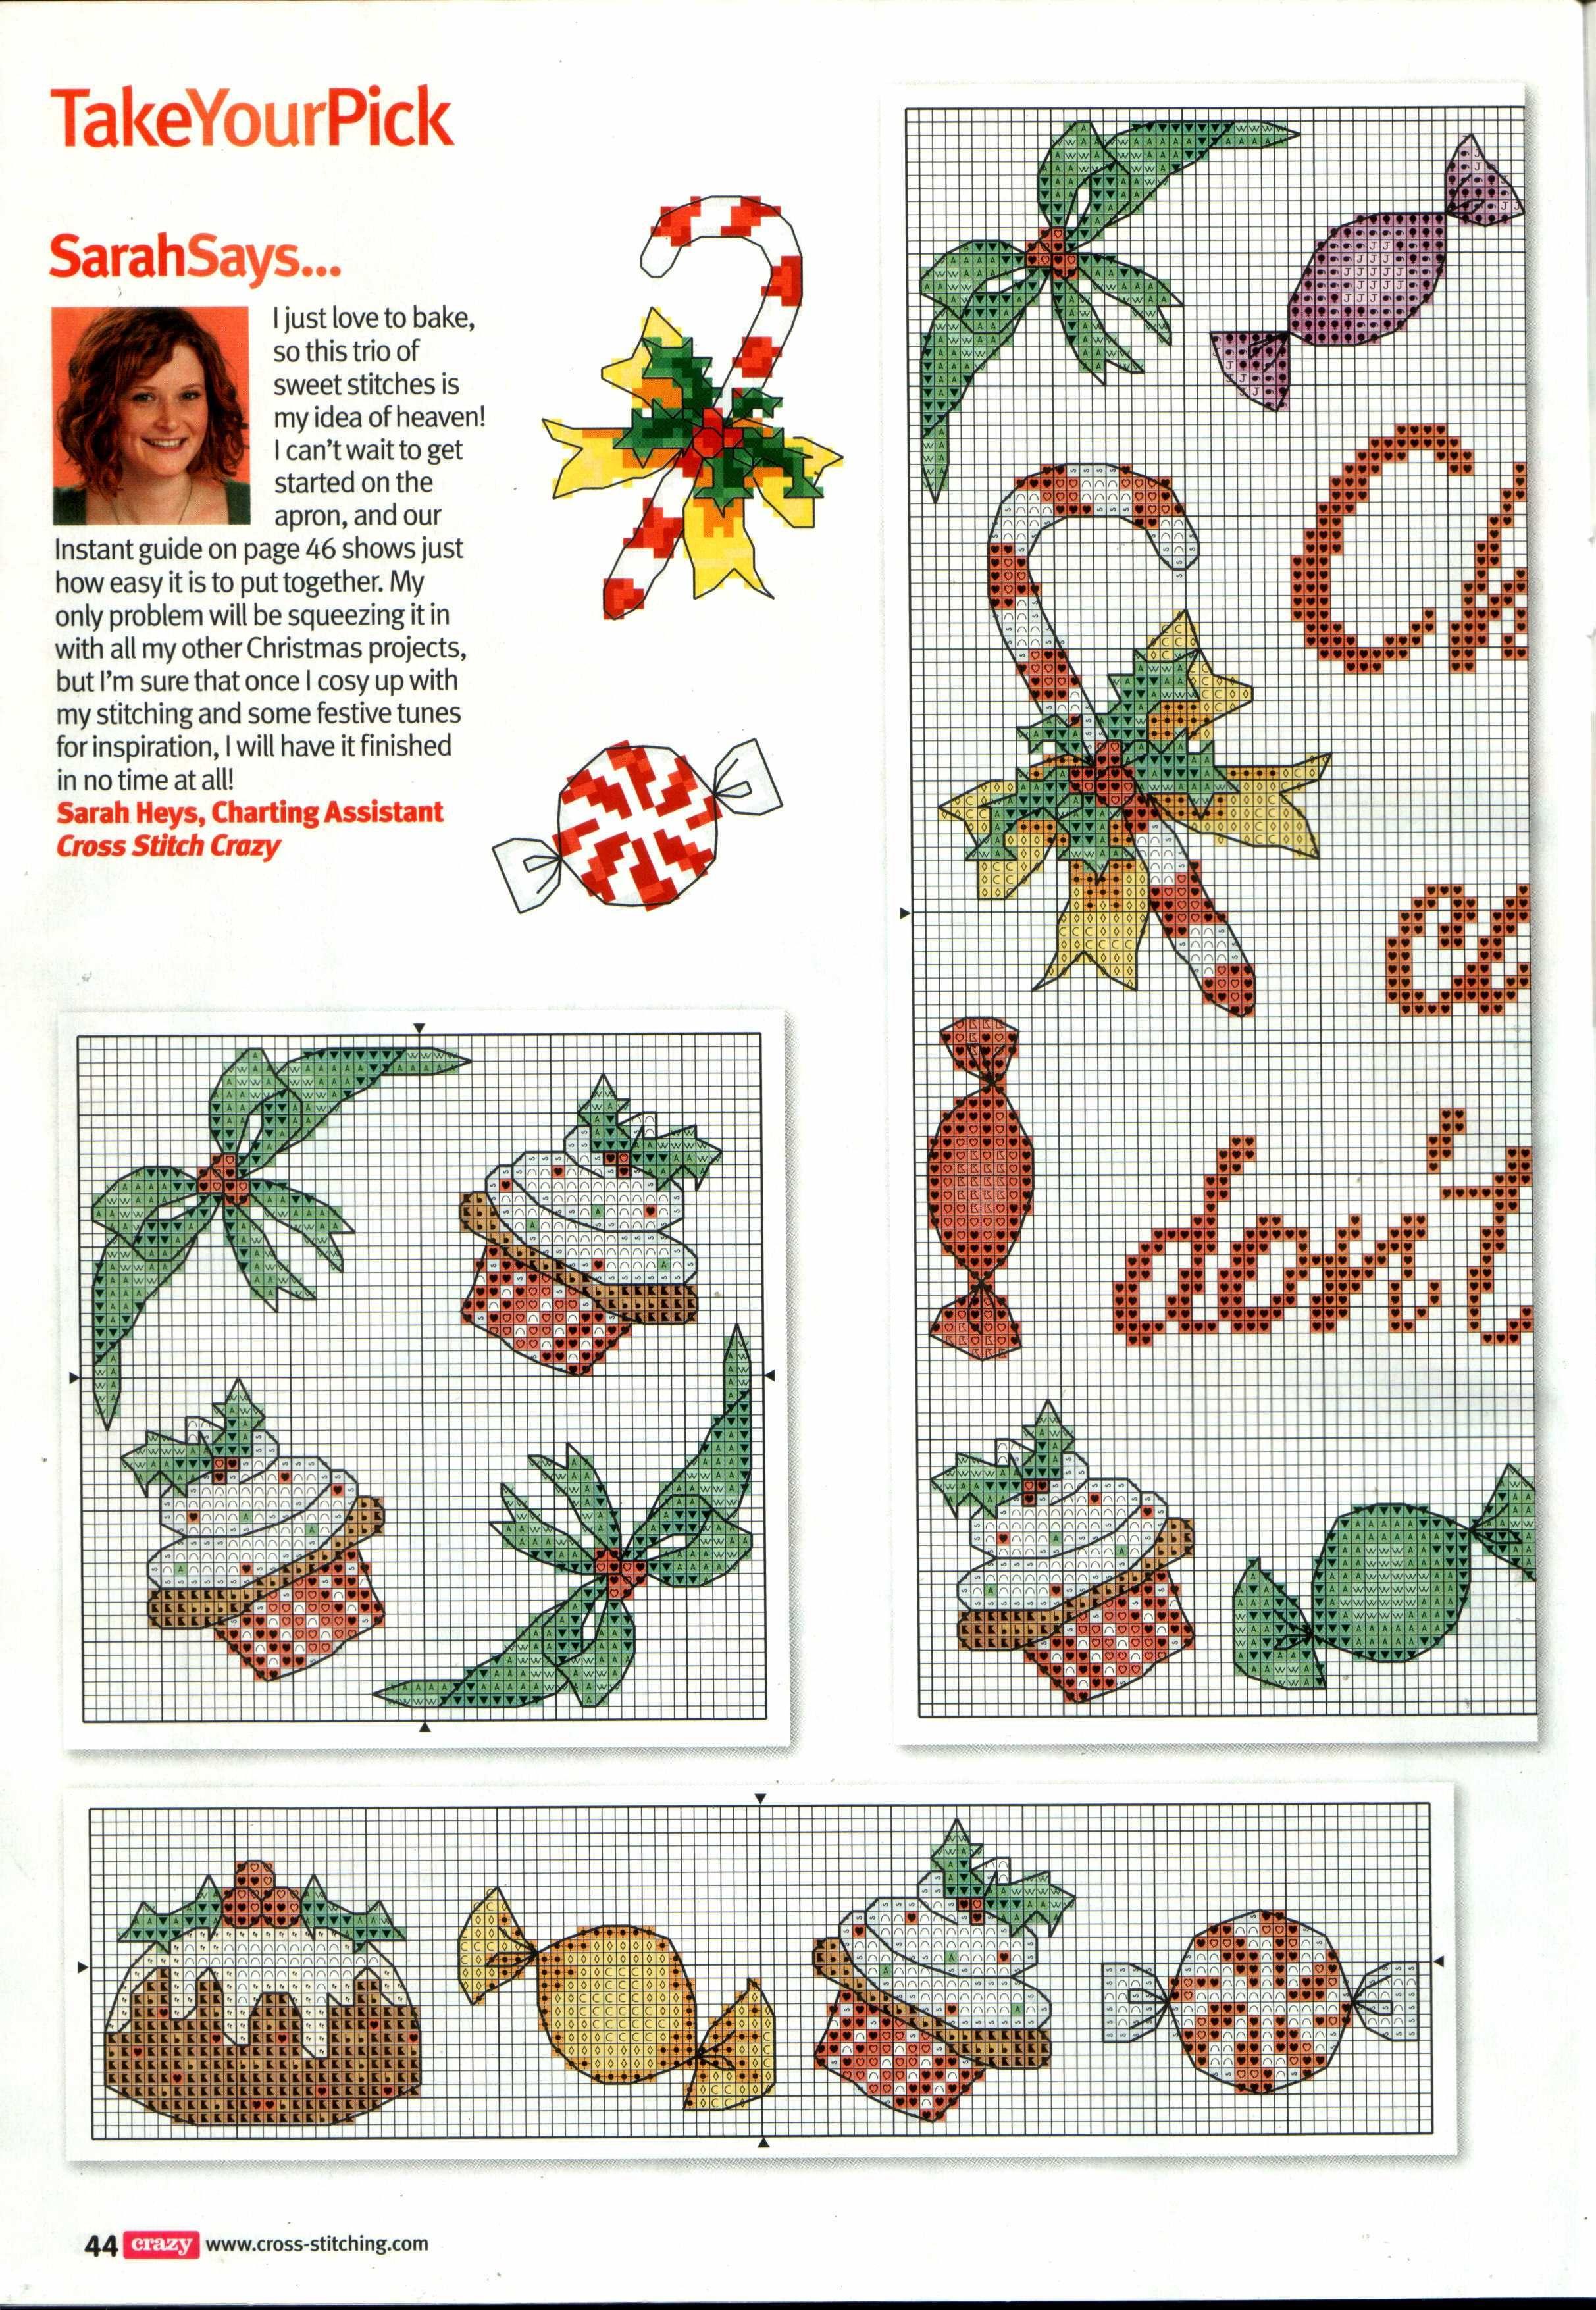 imgbox - fast, simple image host | Punto de Cruz Navidad | Pinterest ...